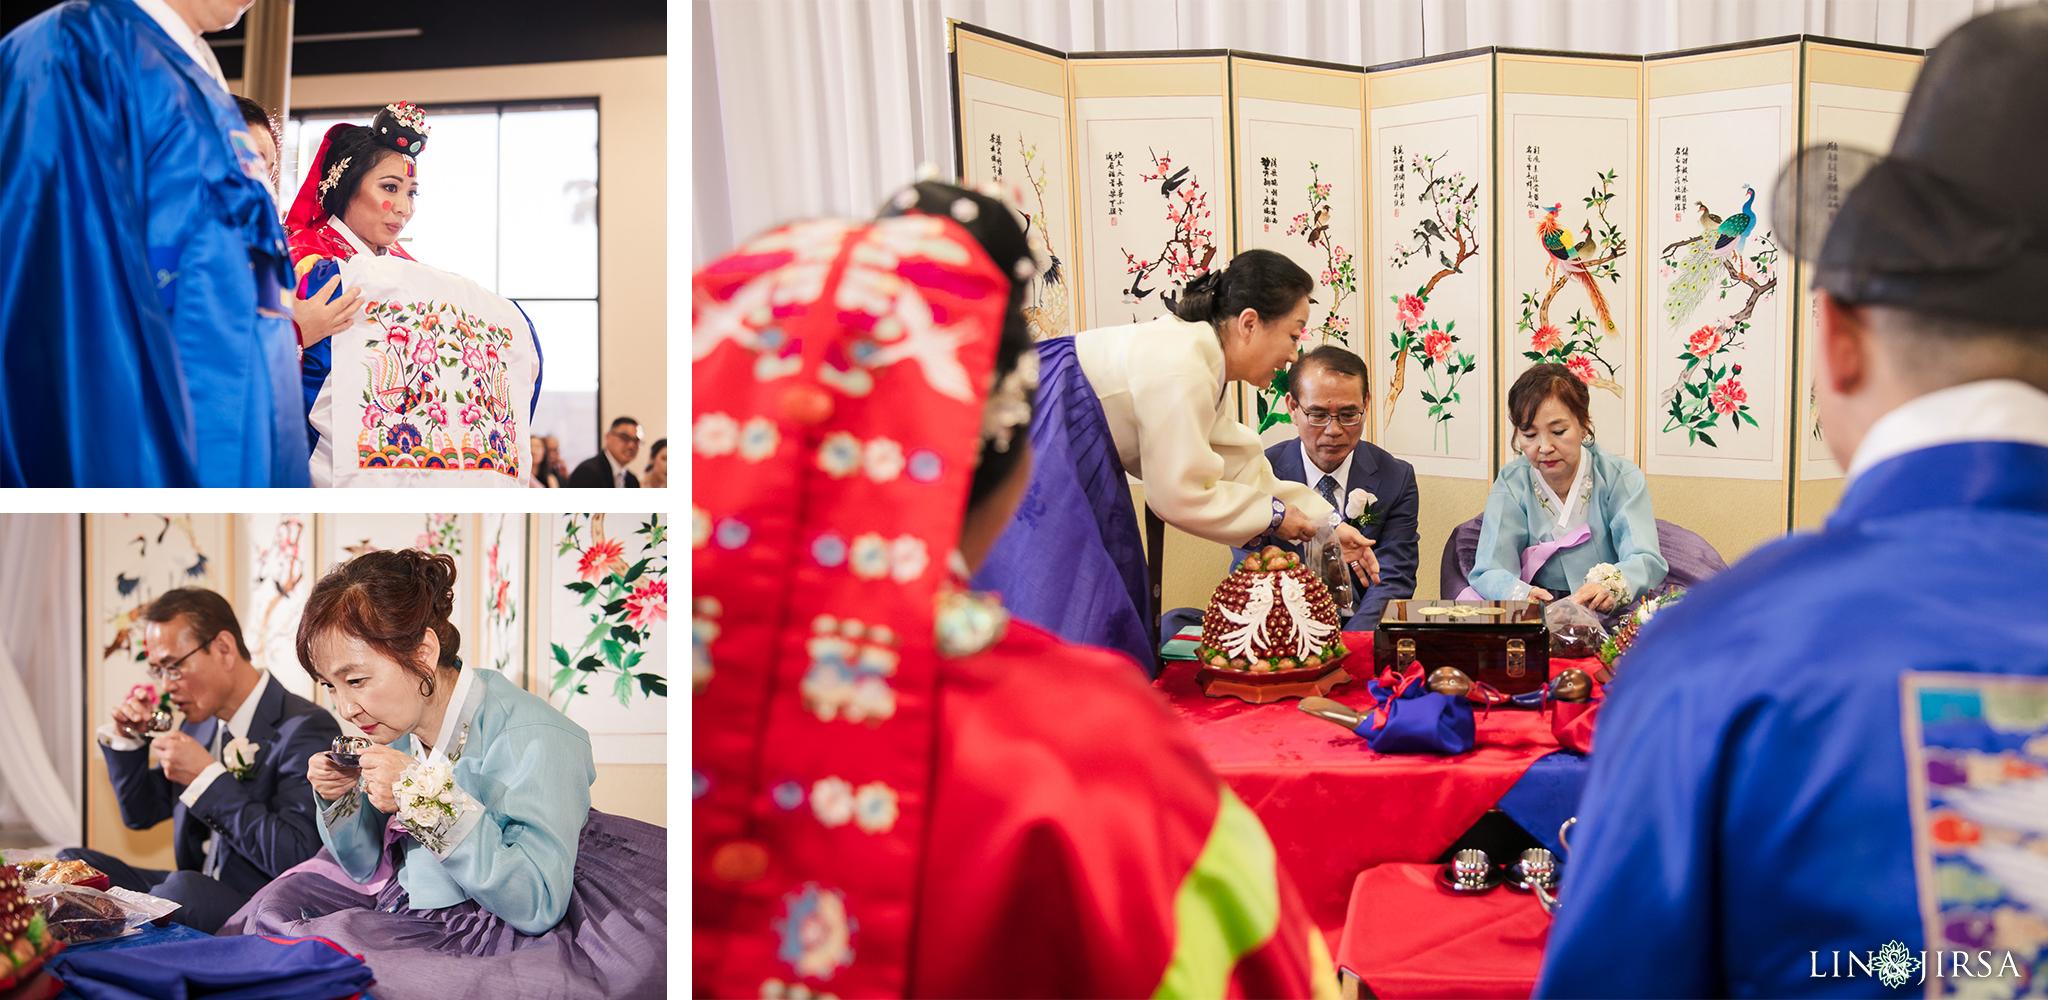 23 Business Expo Center Orange County Korean Wedding Ceremony Photography